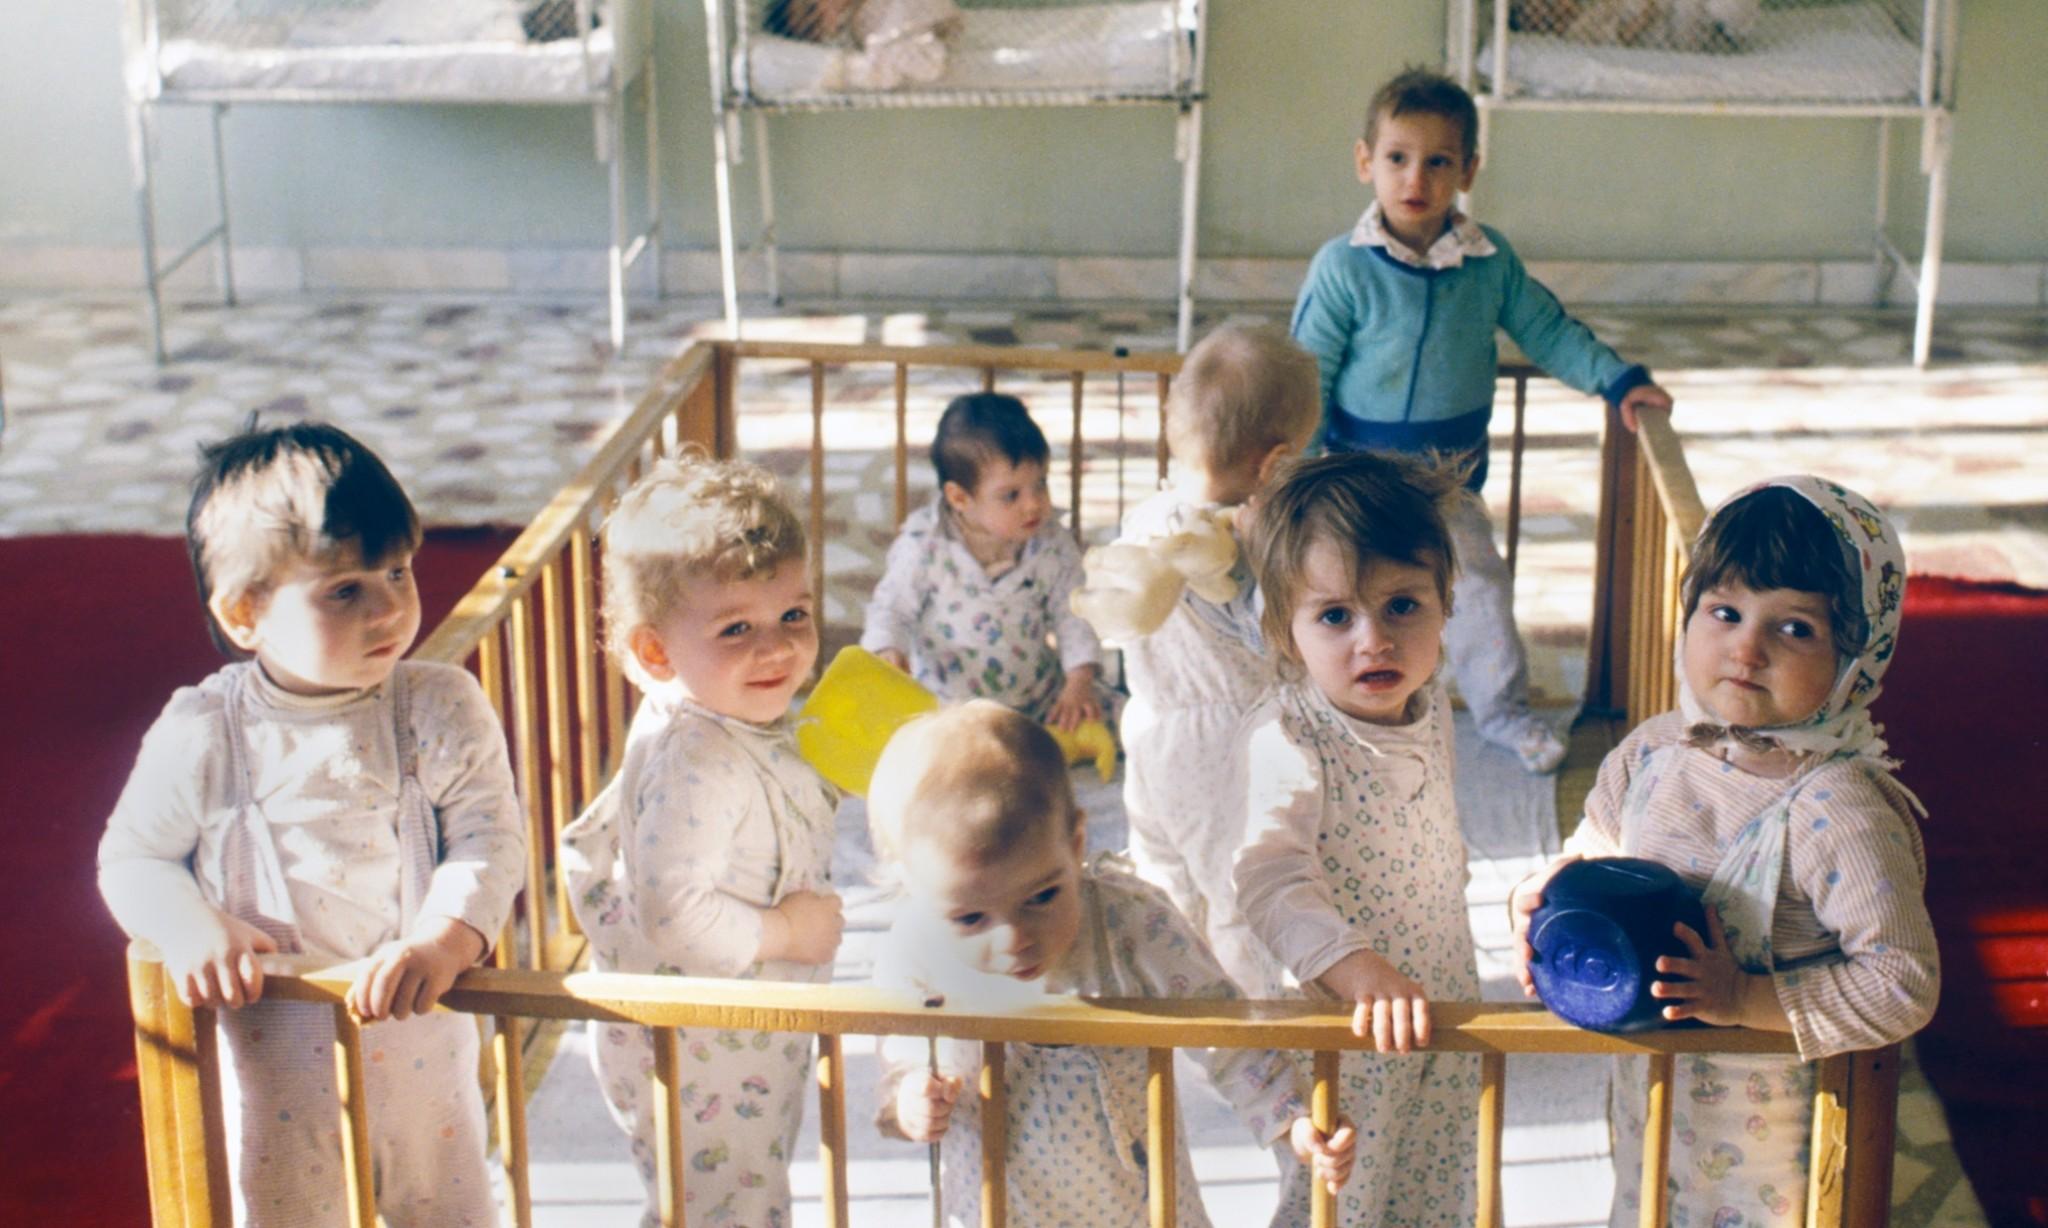 Ceausescu's children